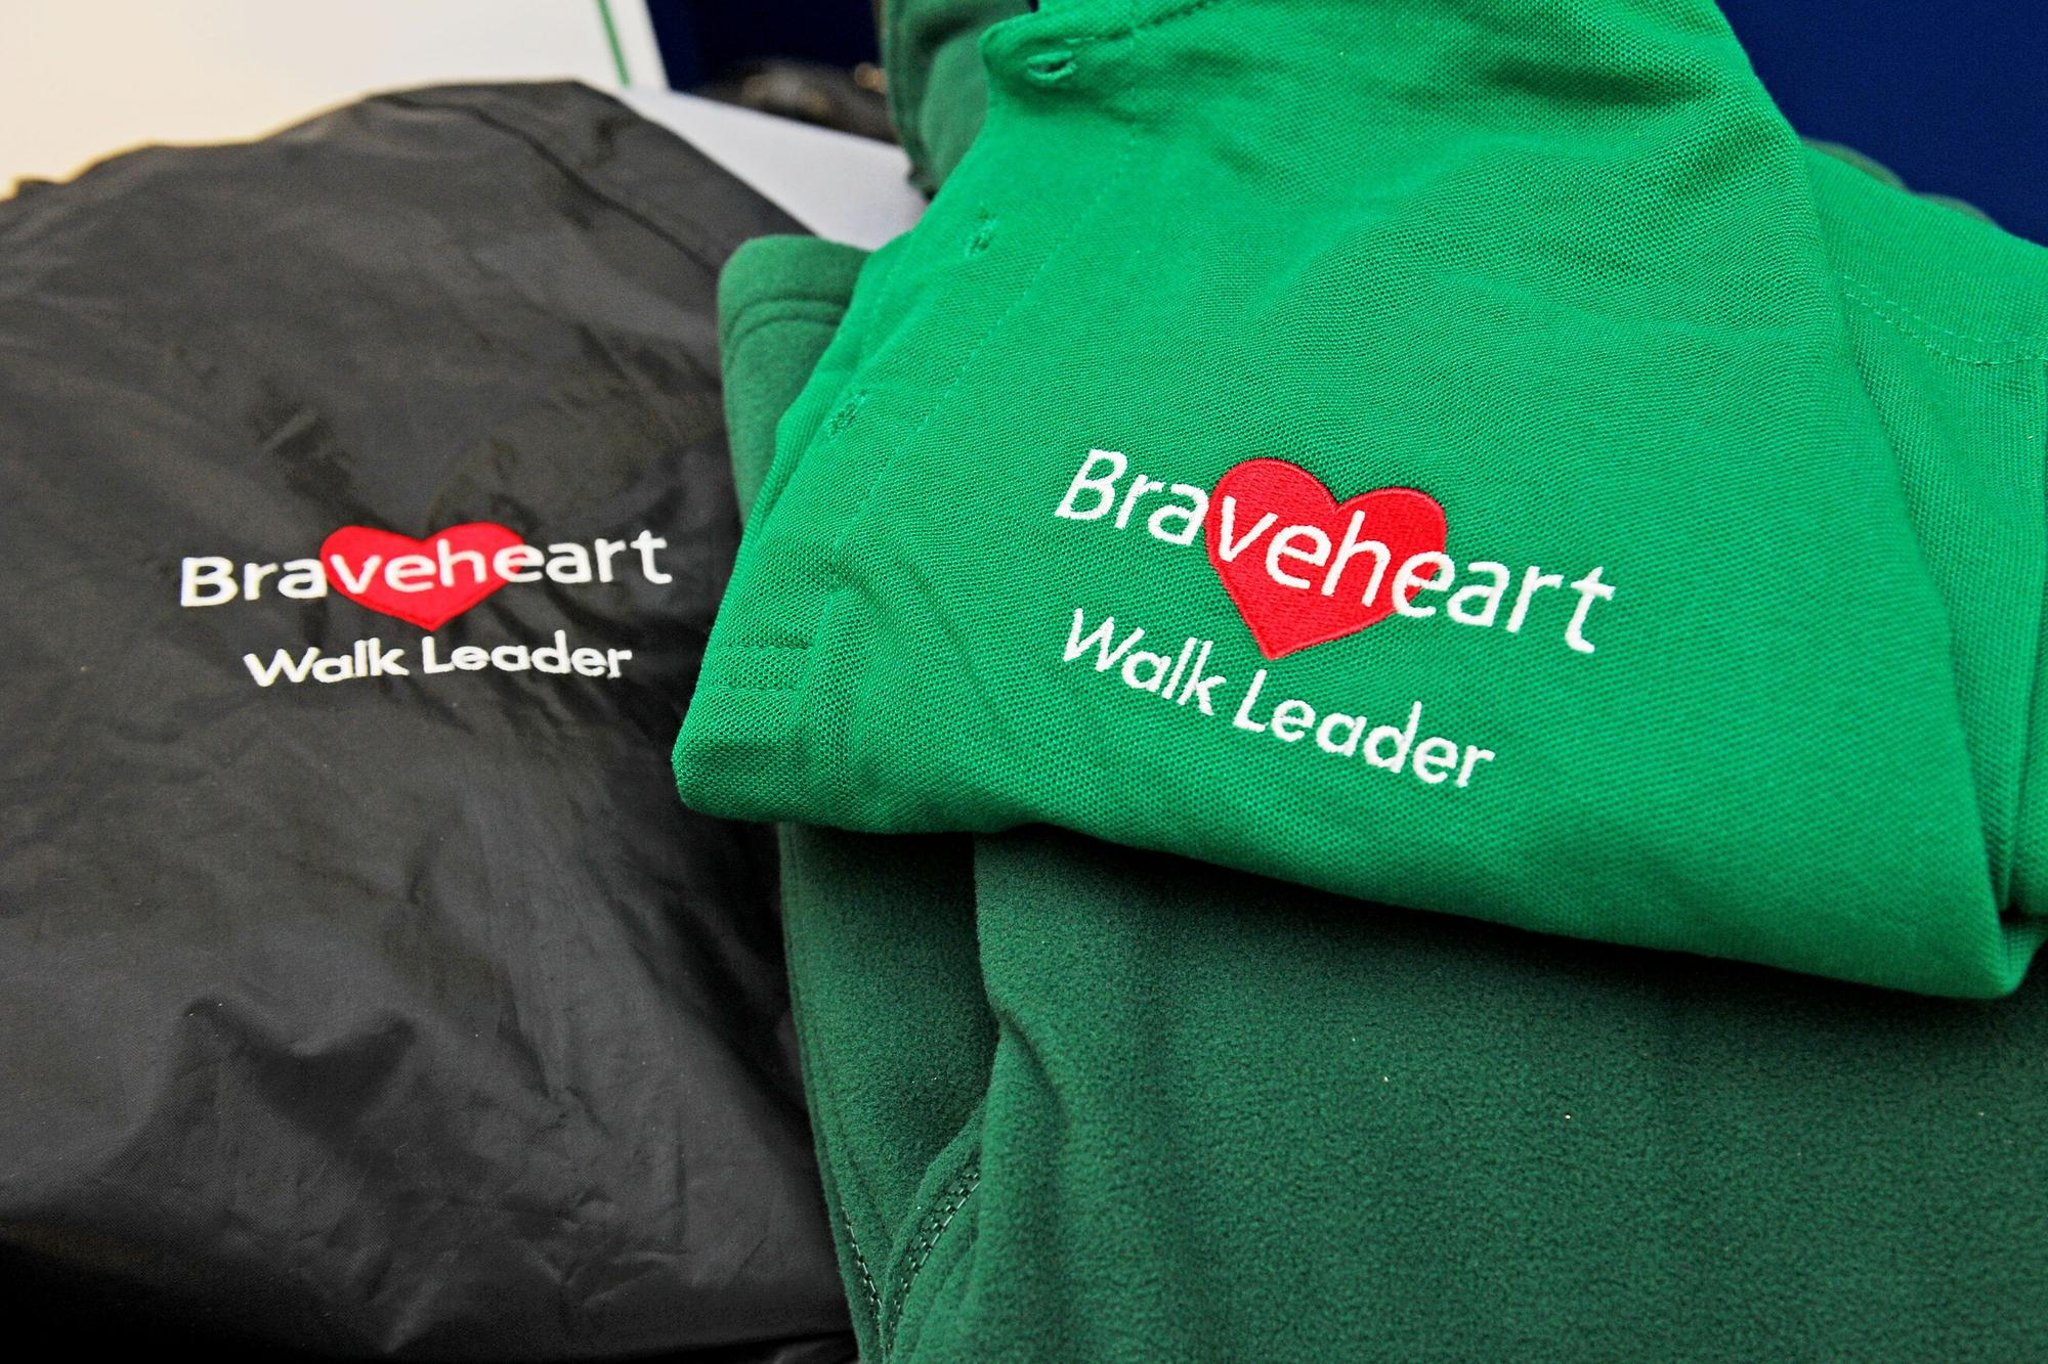 Braveheart launches new post lockdown walk in Denny